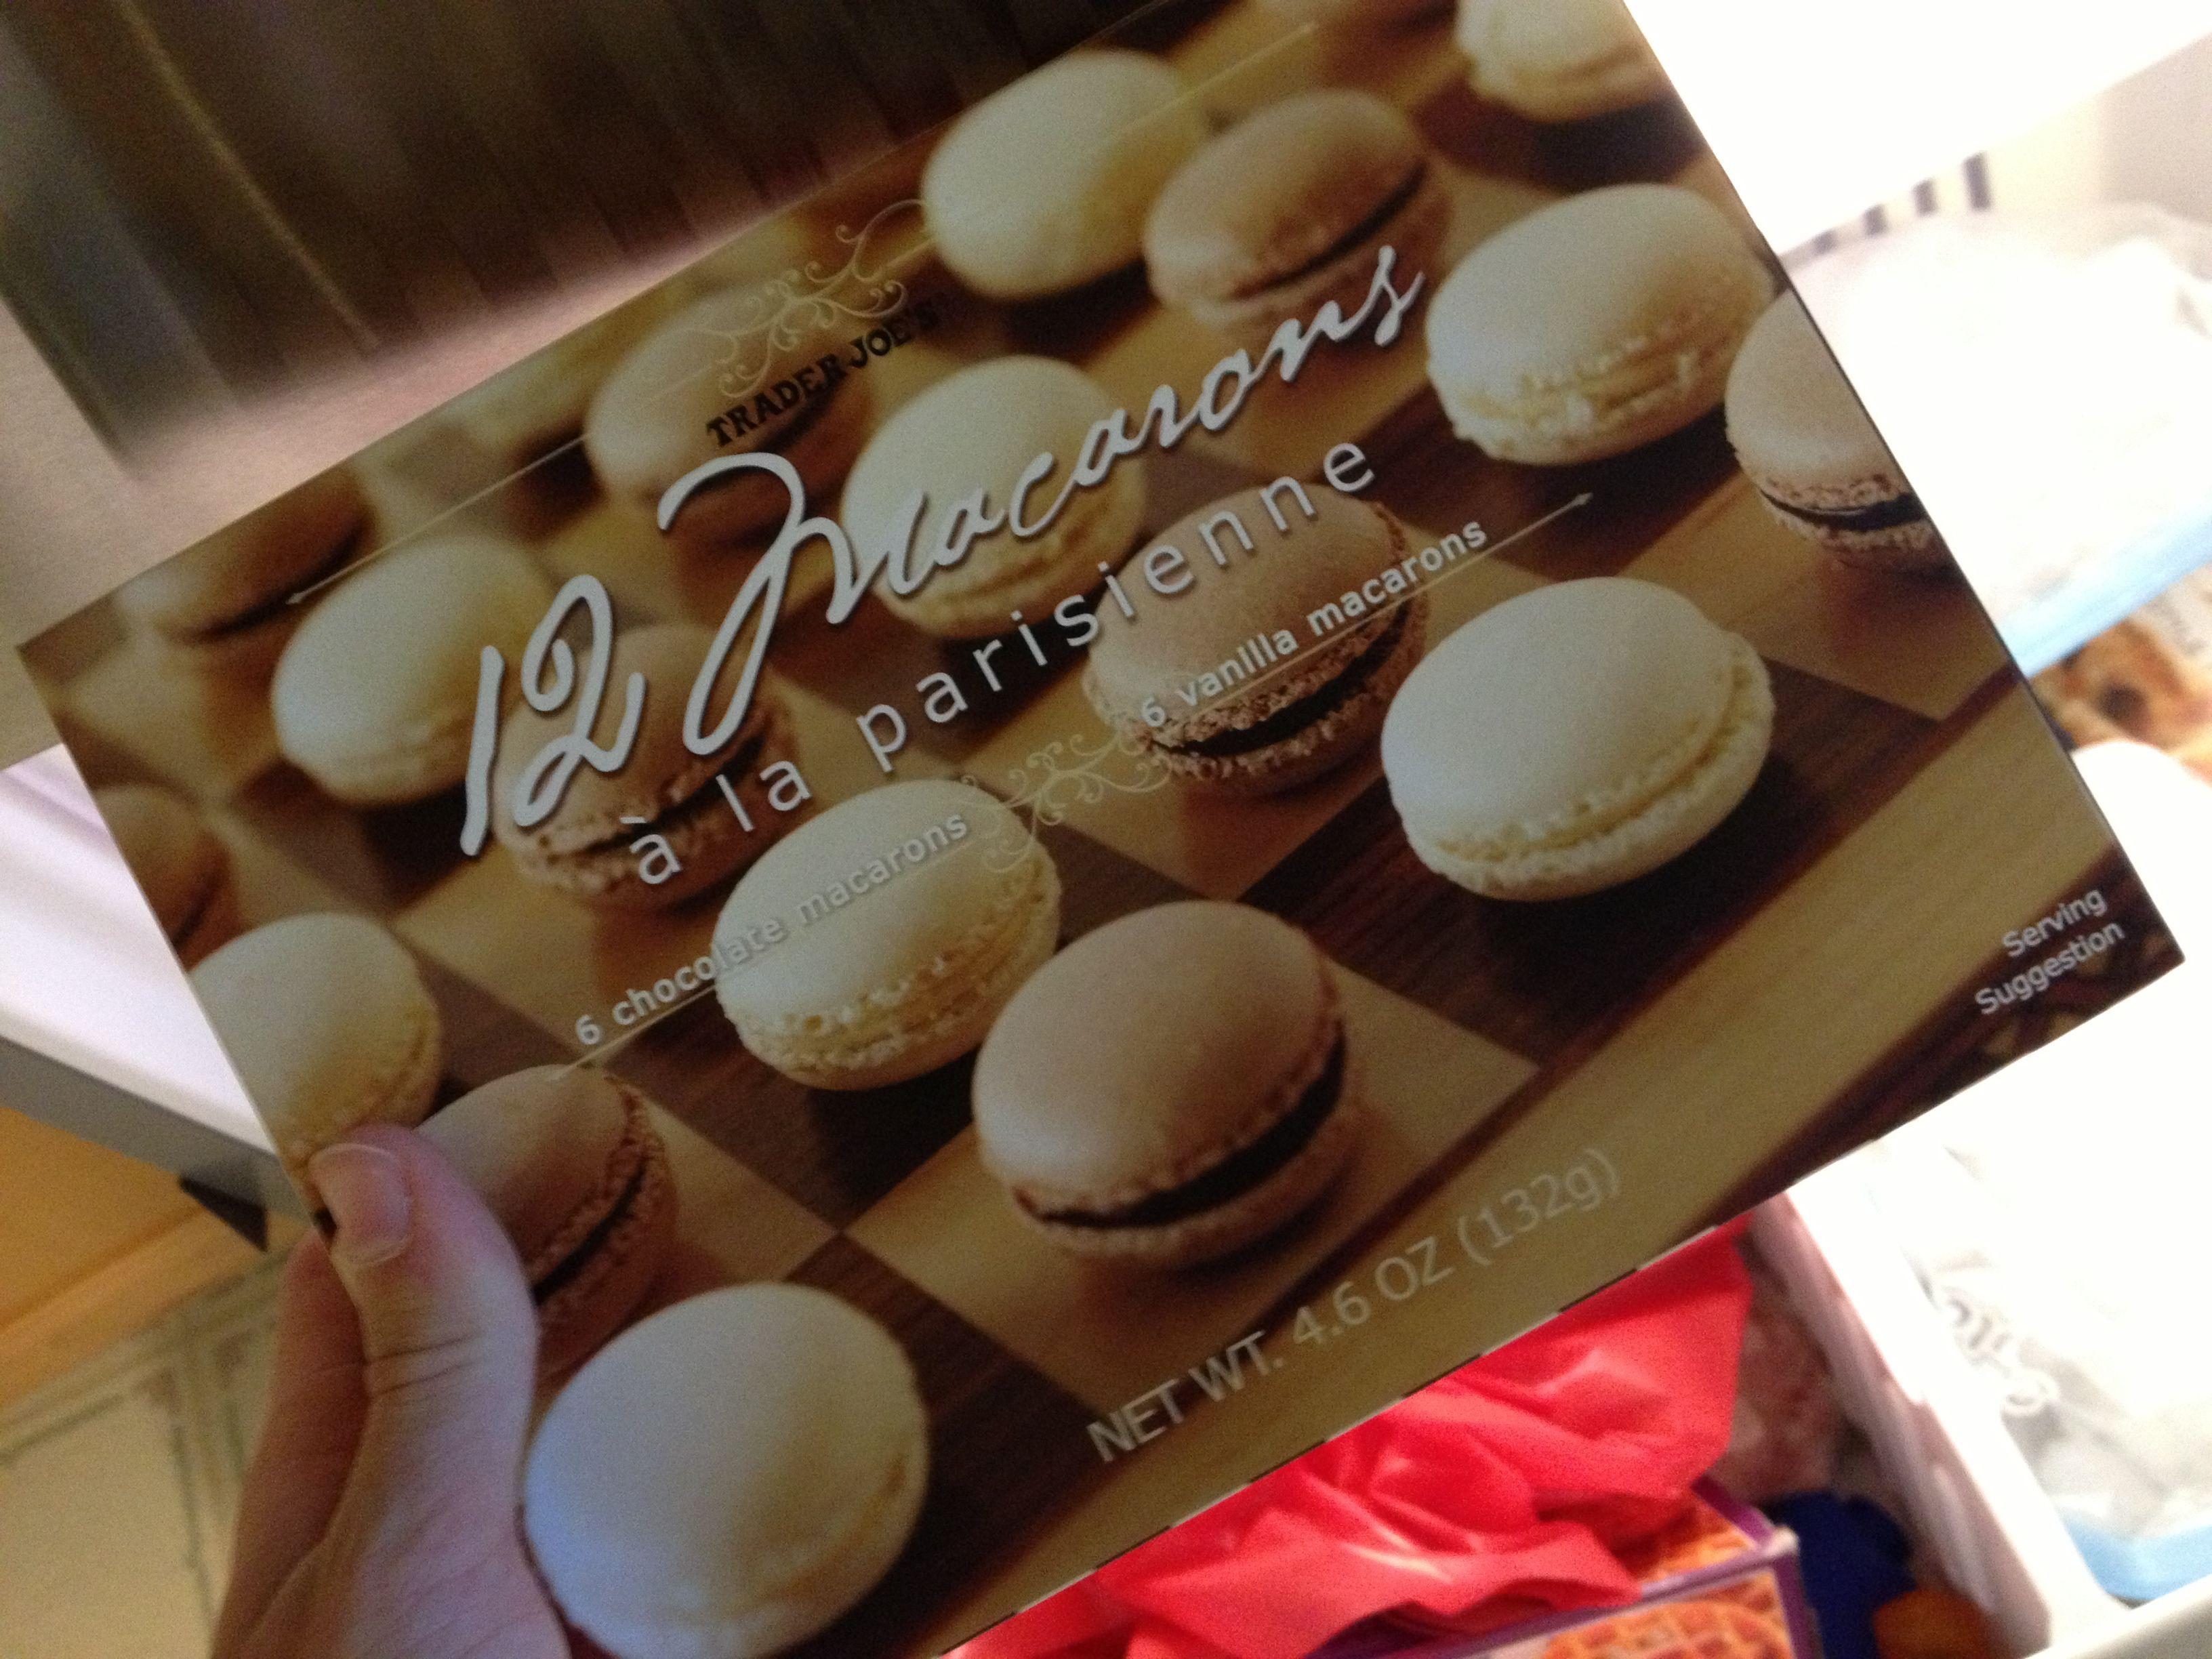 Macaroons Vanilla and Chocolate from Trader Joe's